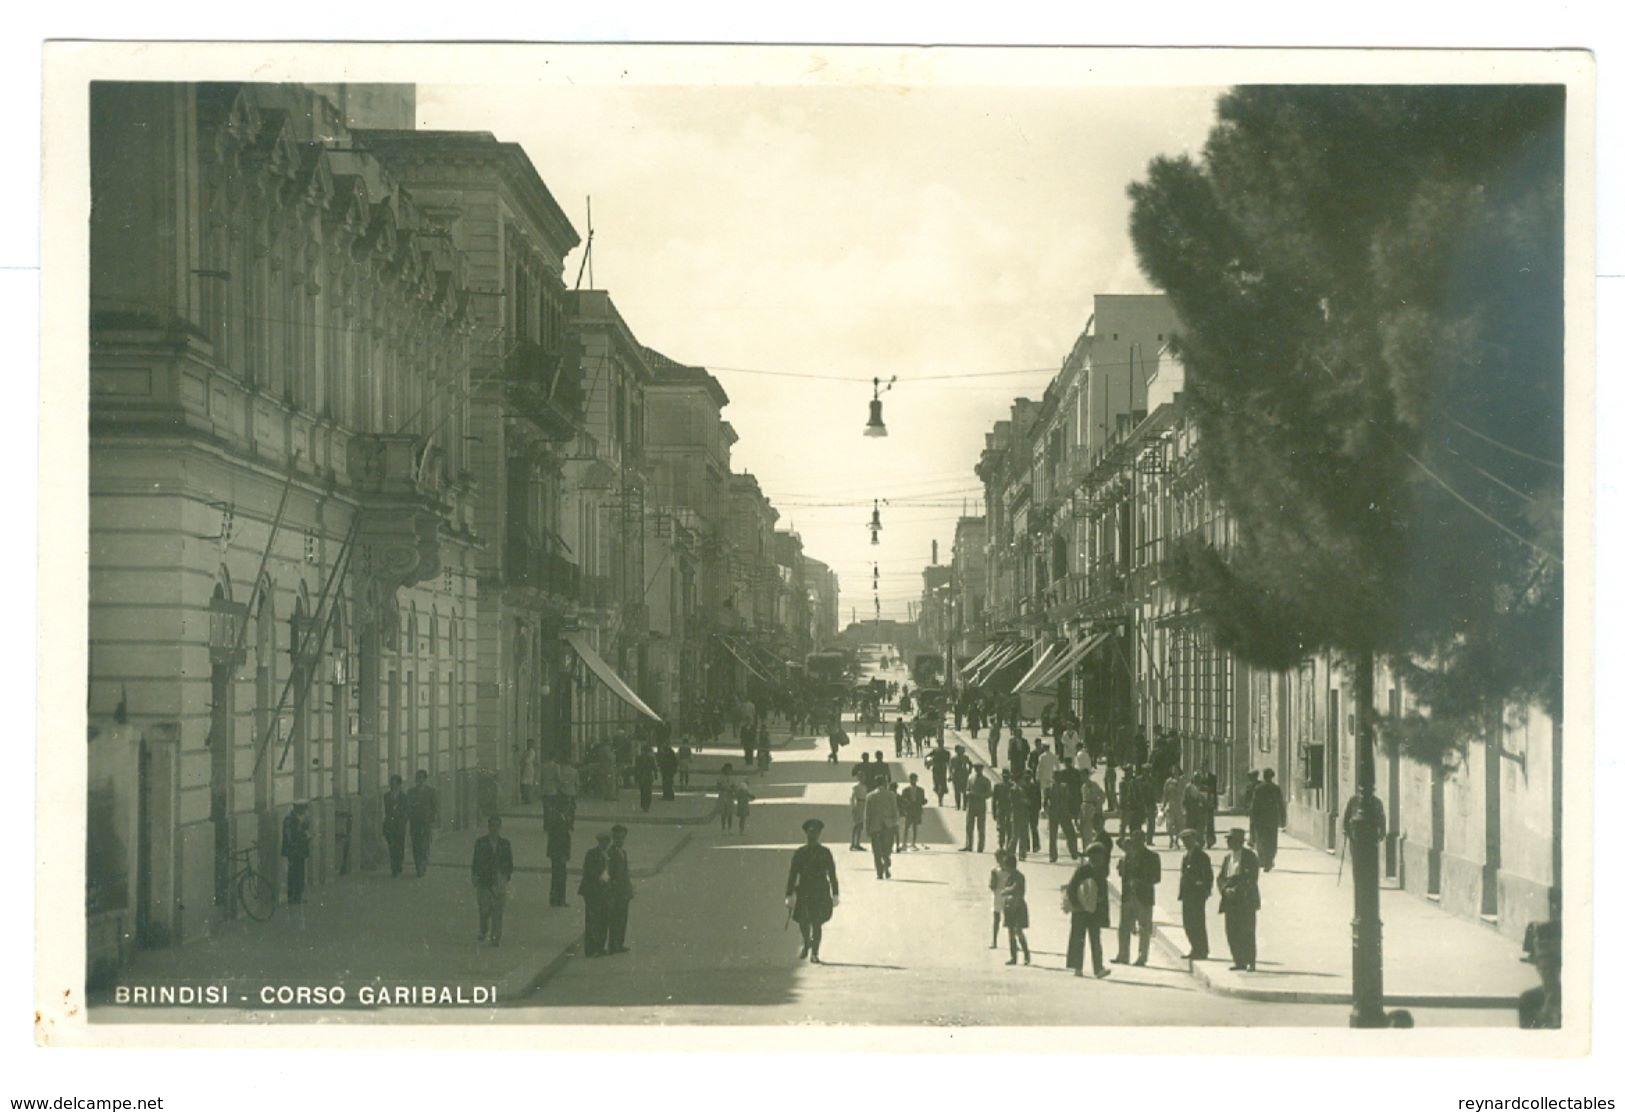 2x, 1900's, Italy, Brindisi, Real Photo Pcs, Unused. - Brindisi